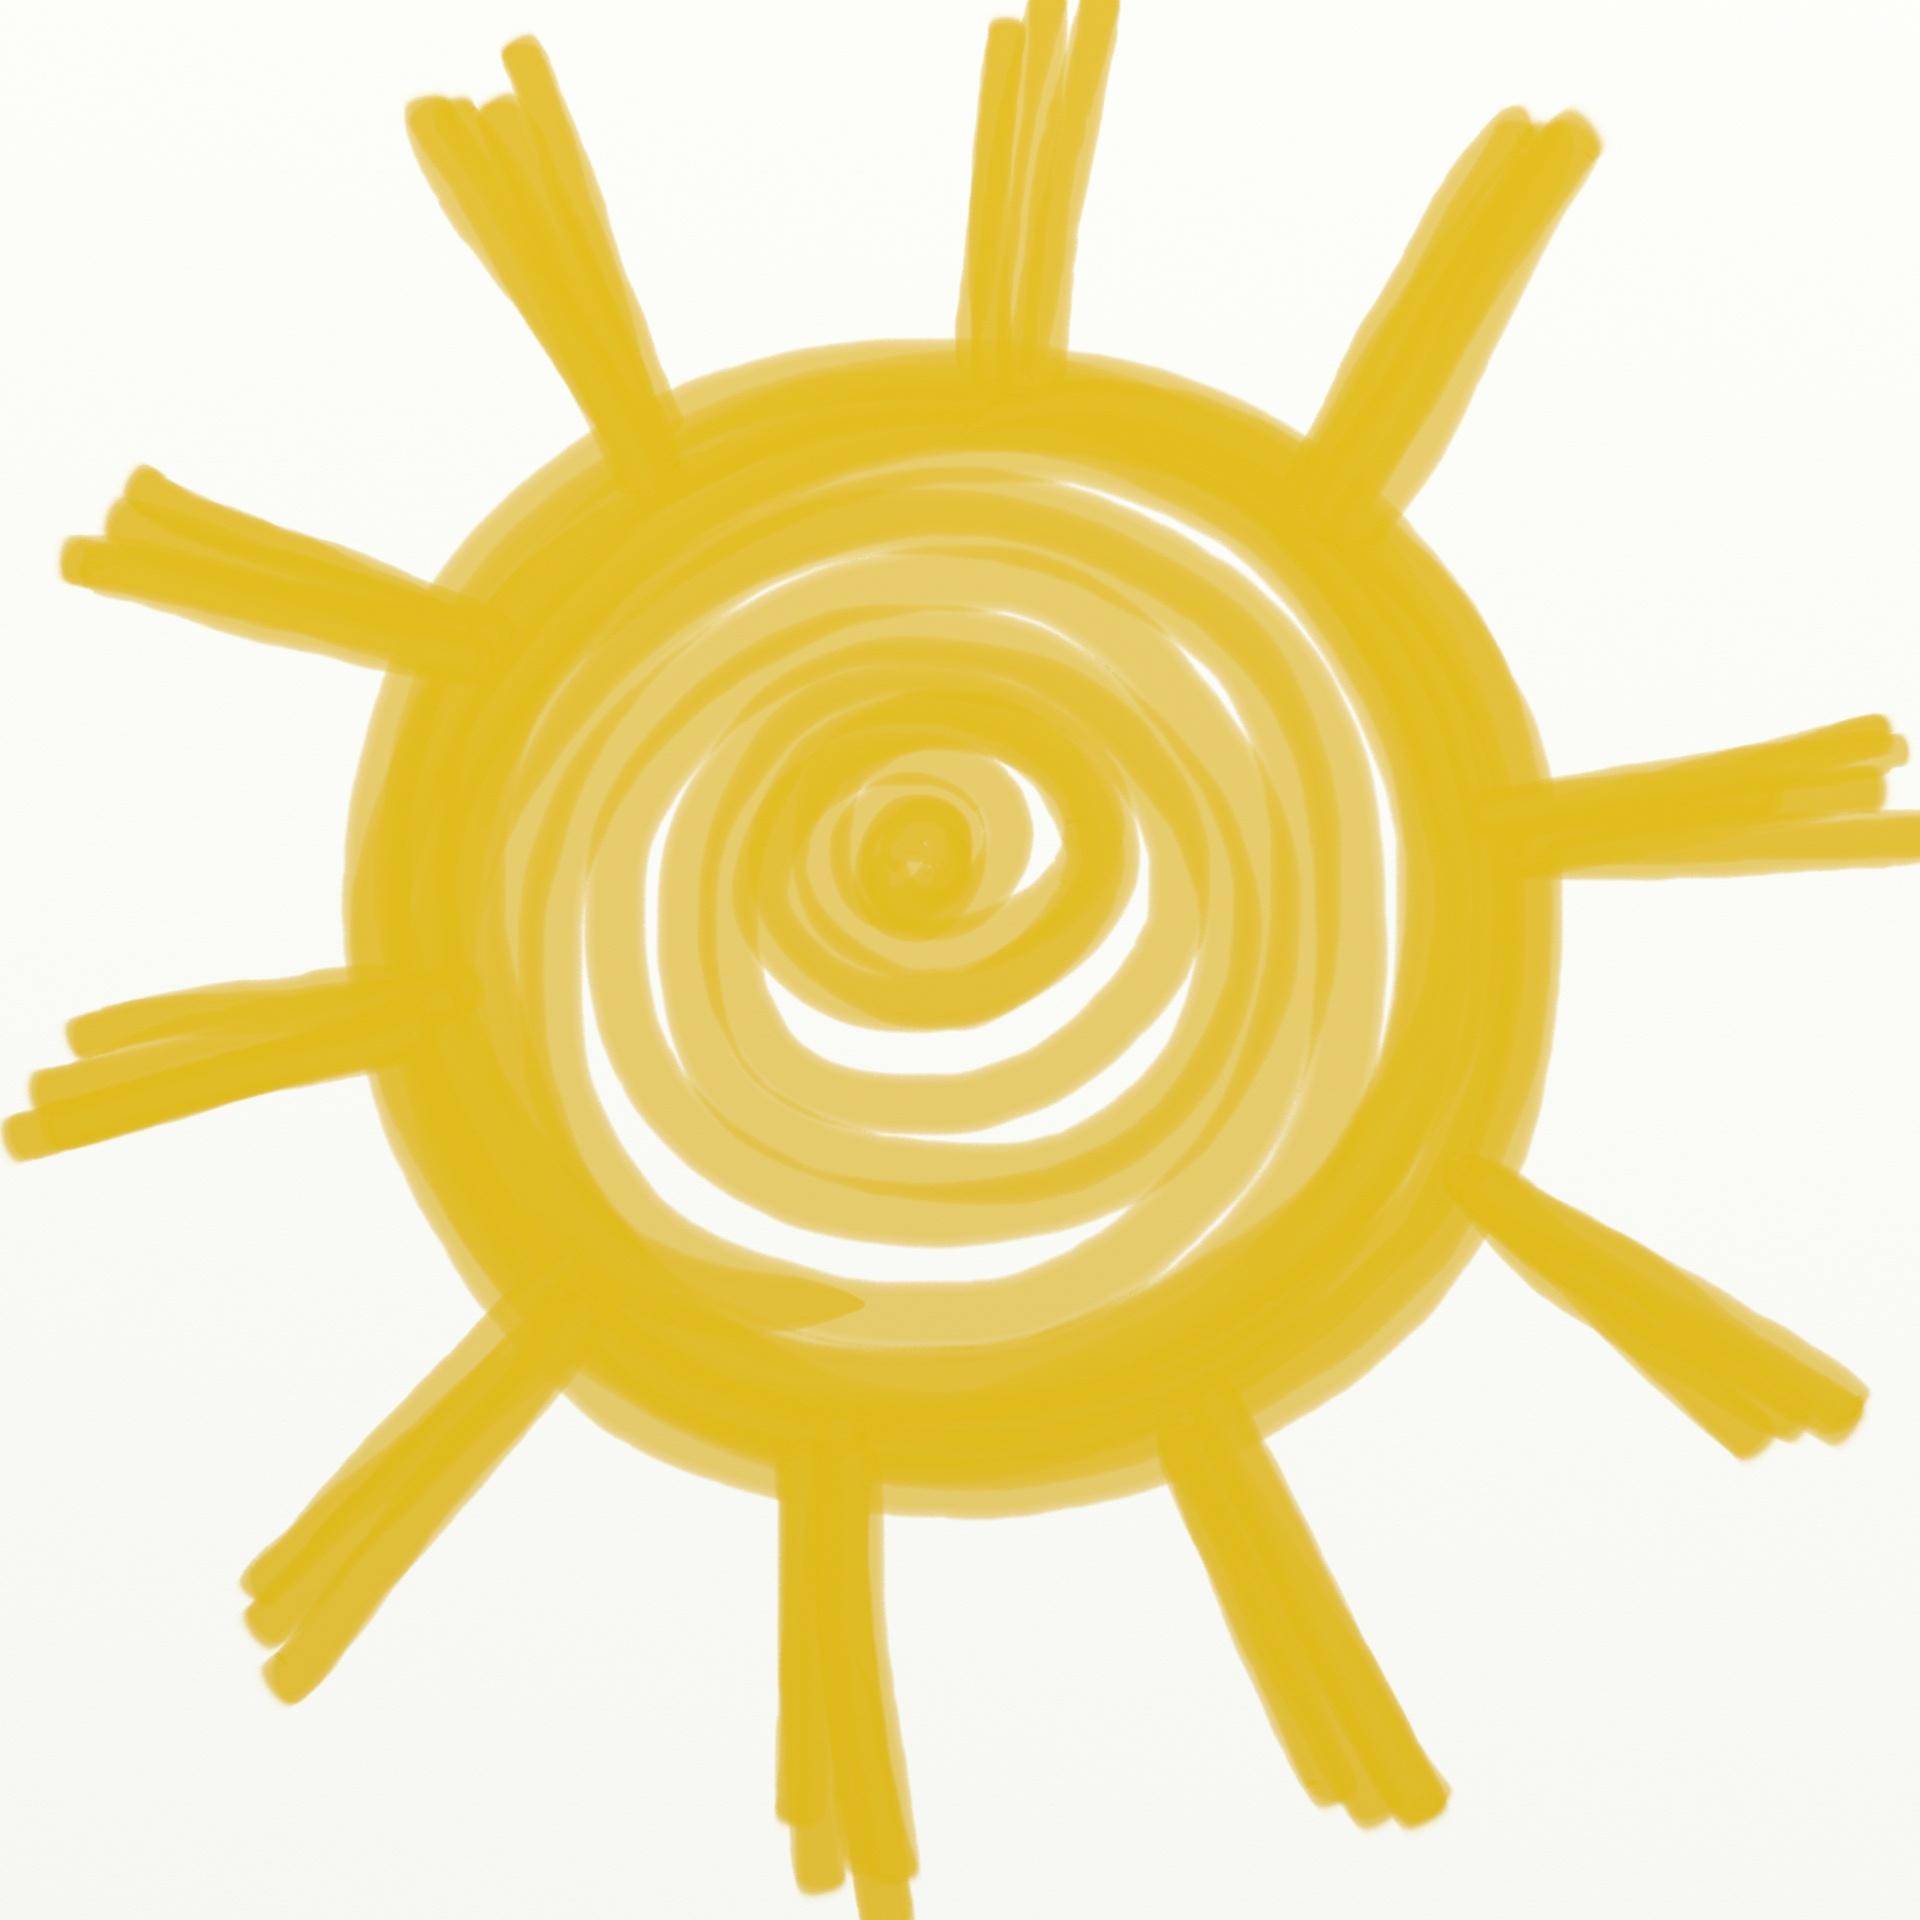 OBRÁZEK : sun-14453375865gh.jpg